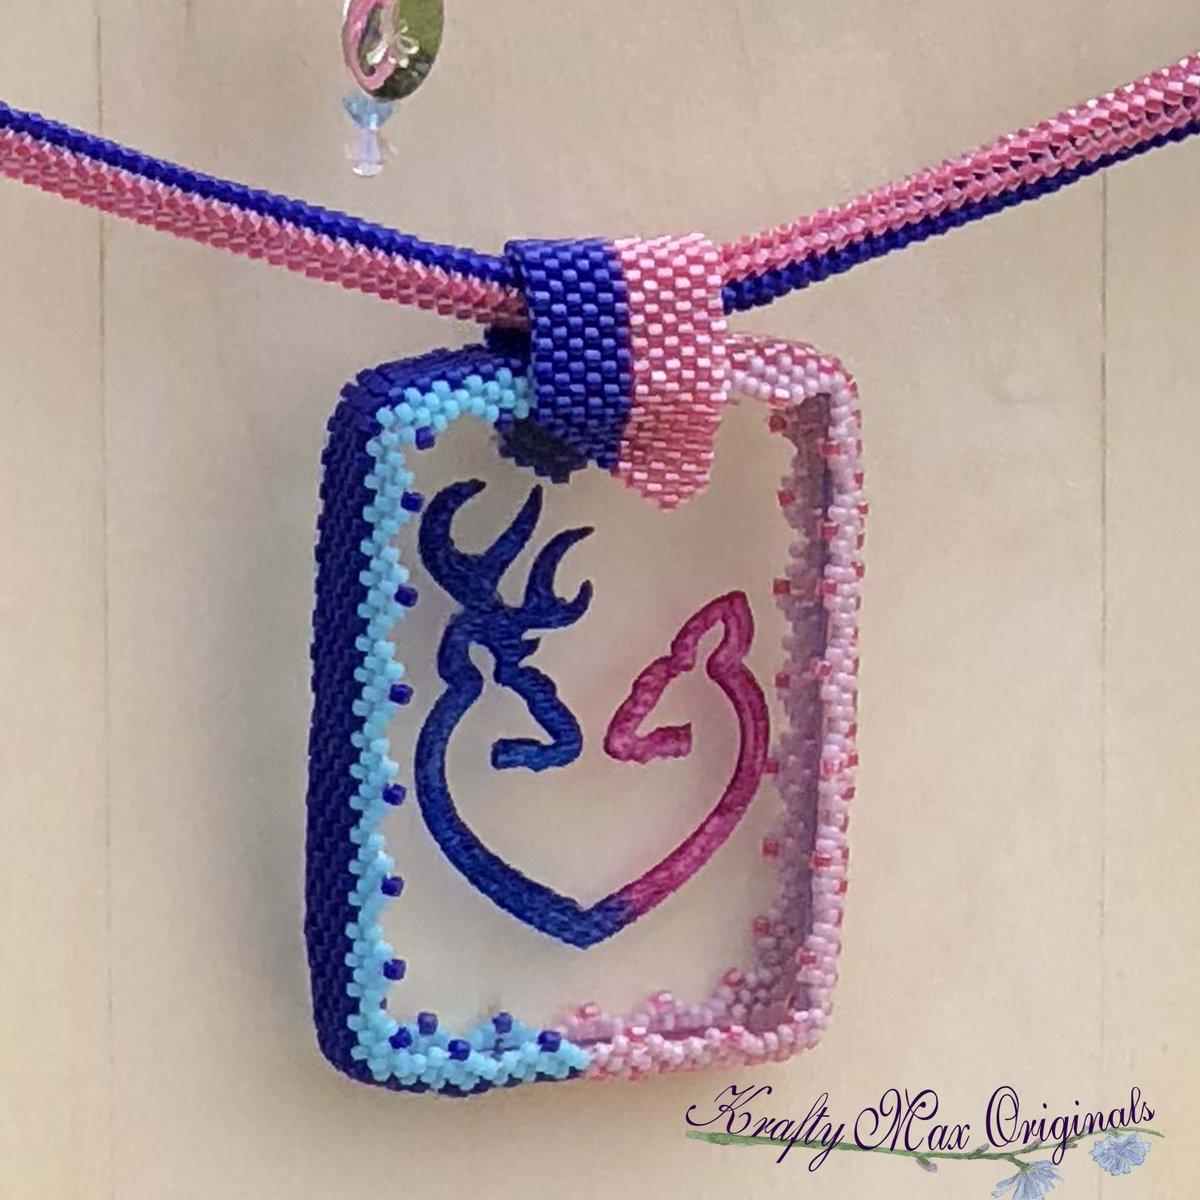 Pink and Blue Deer Beadwoven Wearable Art Necklace with Center from Wildlife Plastics $77  #handmade #jewelry #supporthandmade #buyhandmade #handmadelove #jewelrydesigner #jewelryart #uniquejewelry #handcrafted #kraftymax #kmax